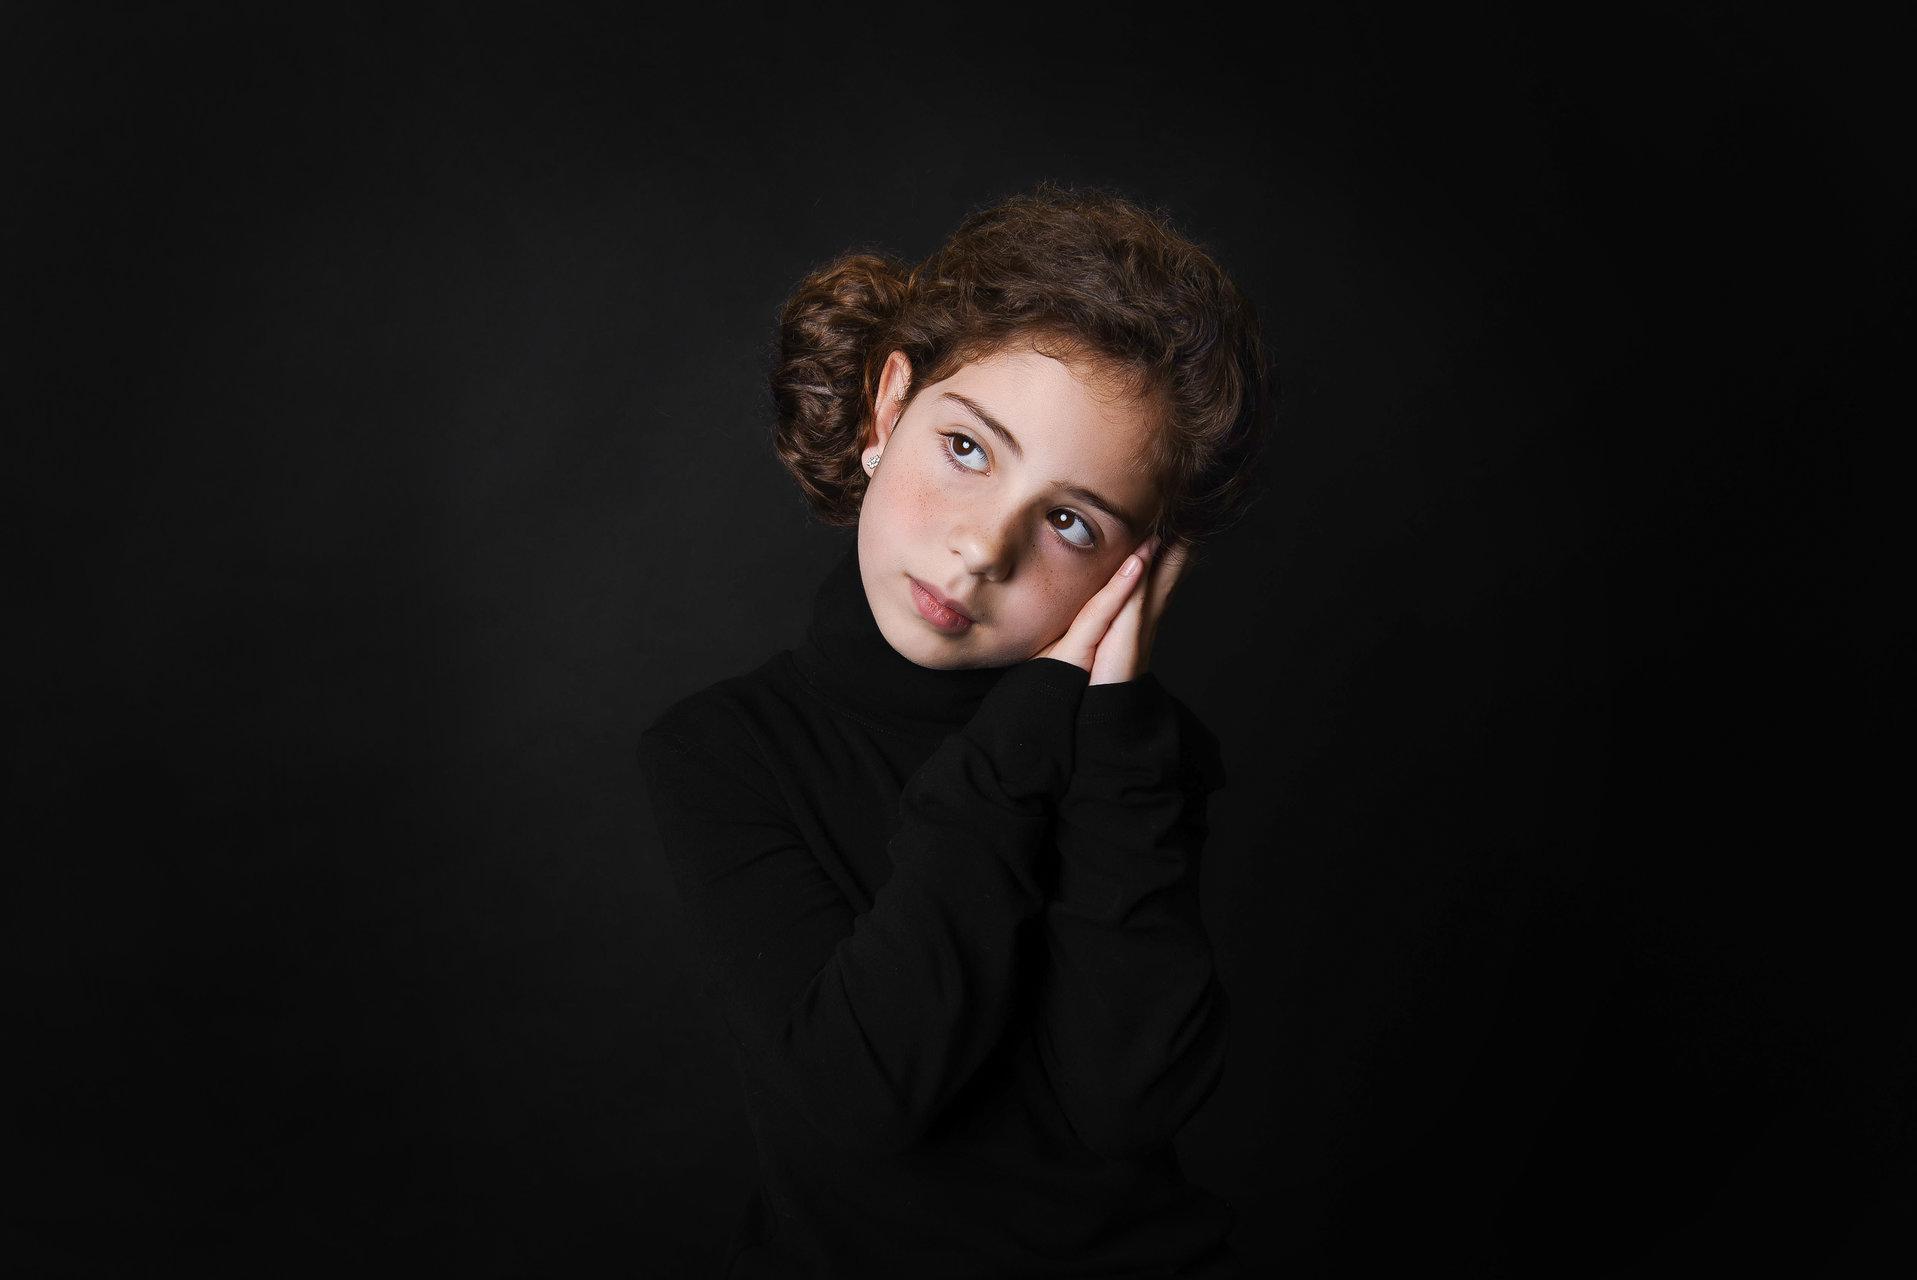 Little beauty от Reneta Petkova - PEHKATA